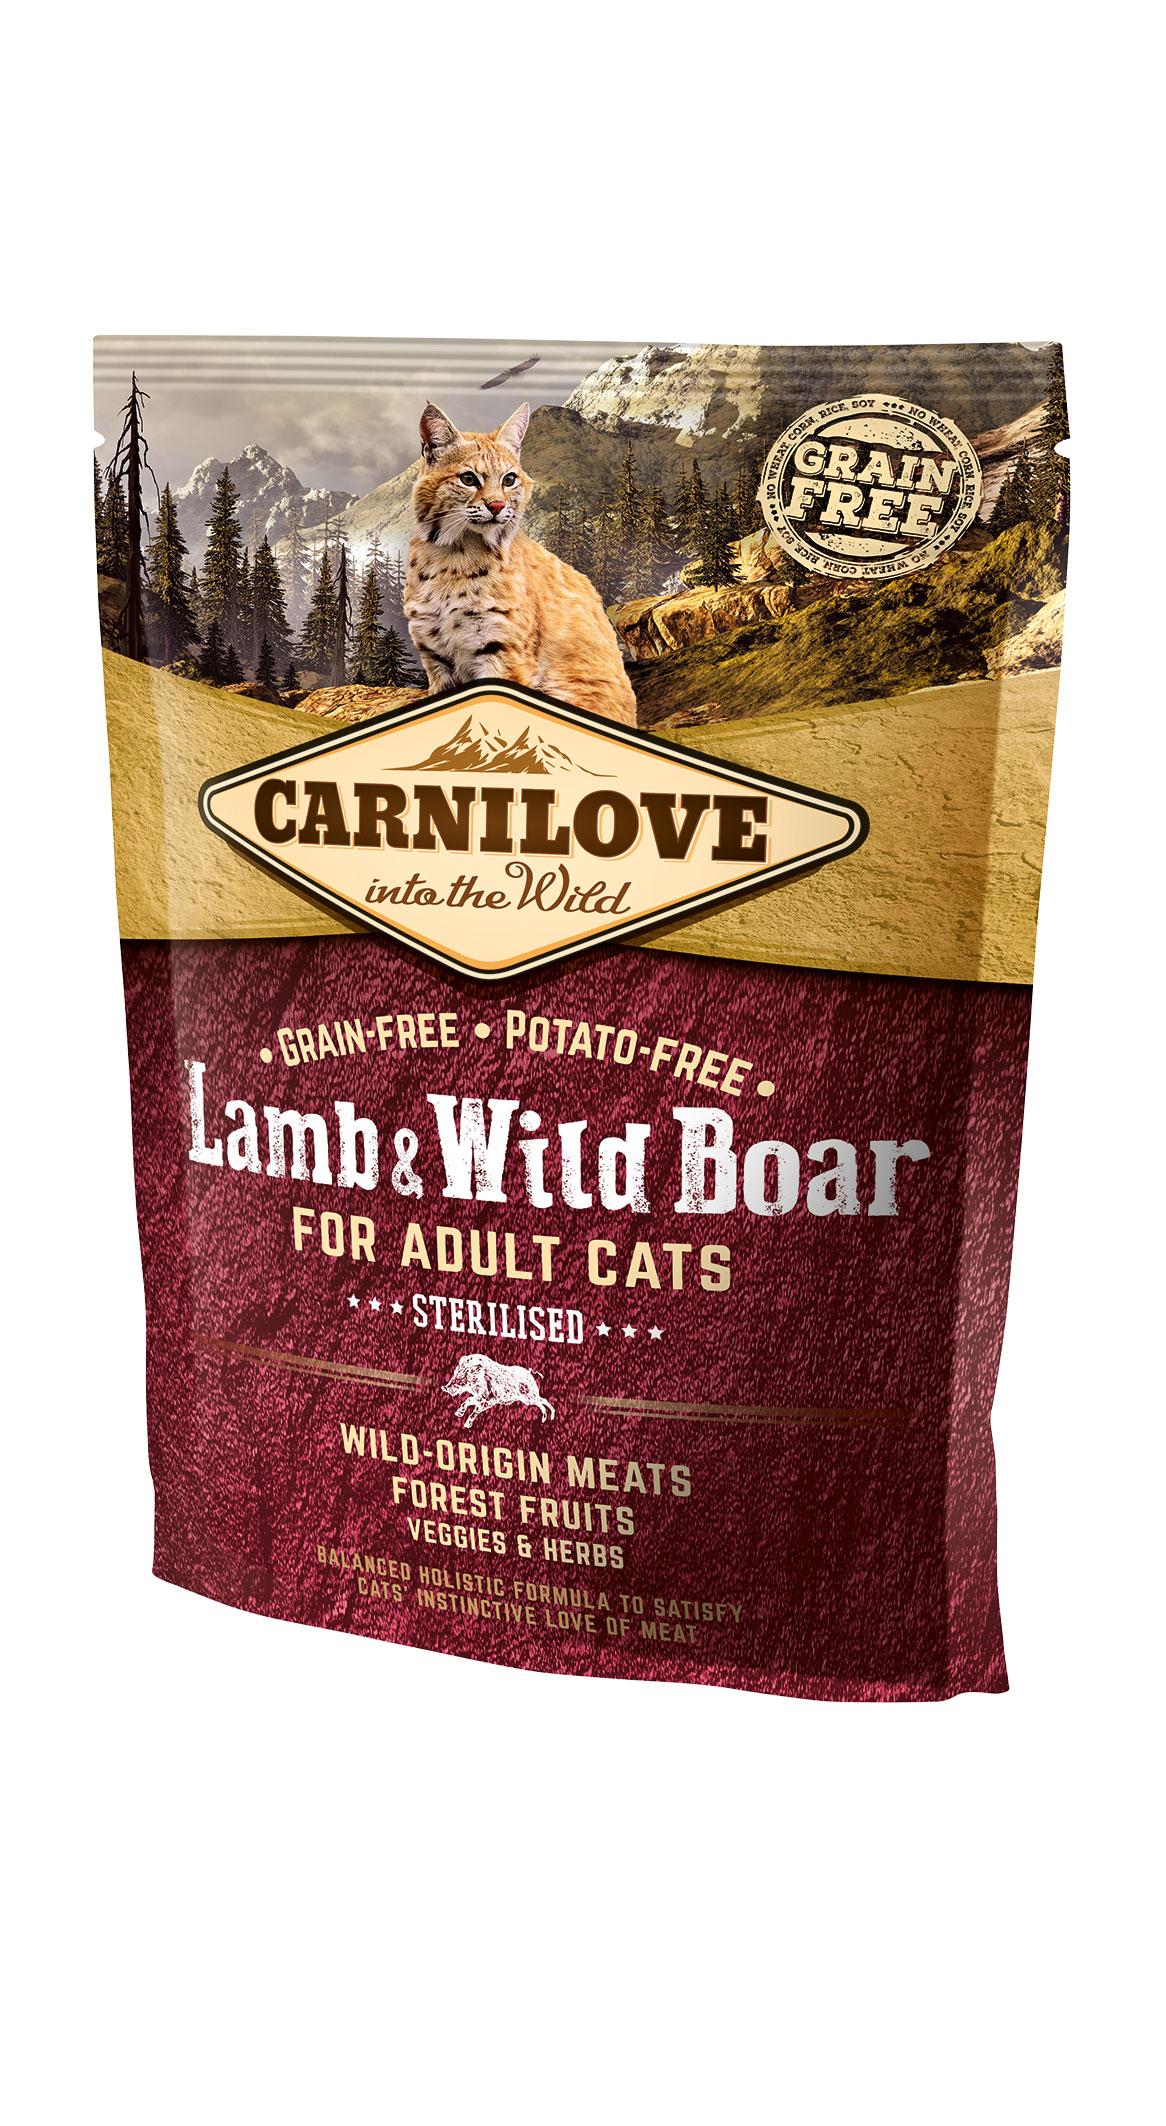 Carnilove Katze - Lamb & Wild Boar/ Sterilised auch für ältere Katzen